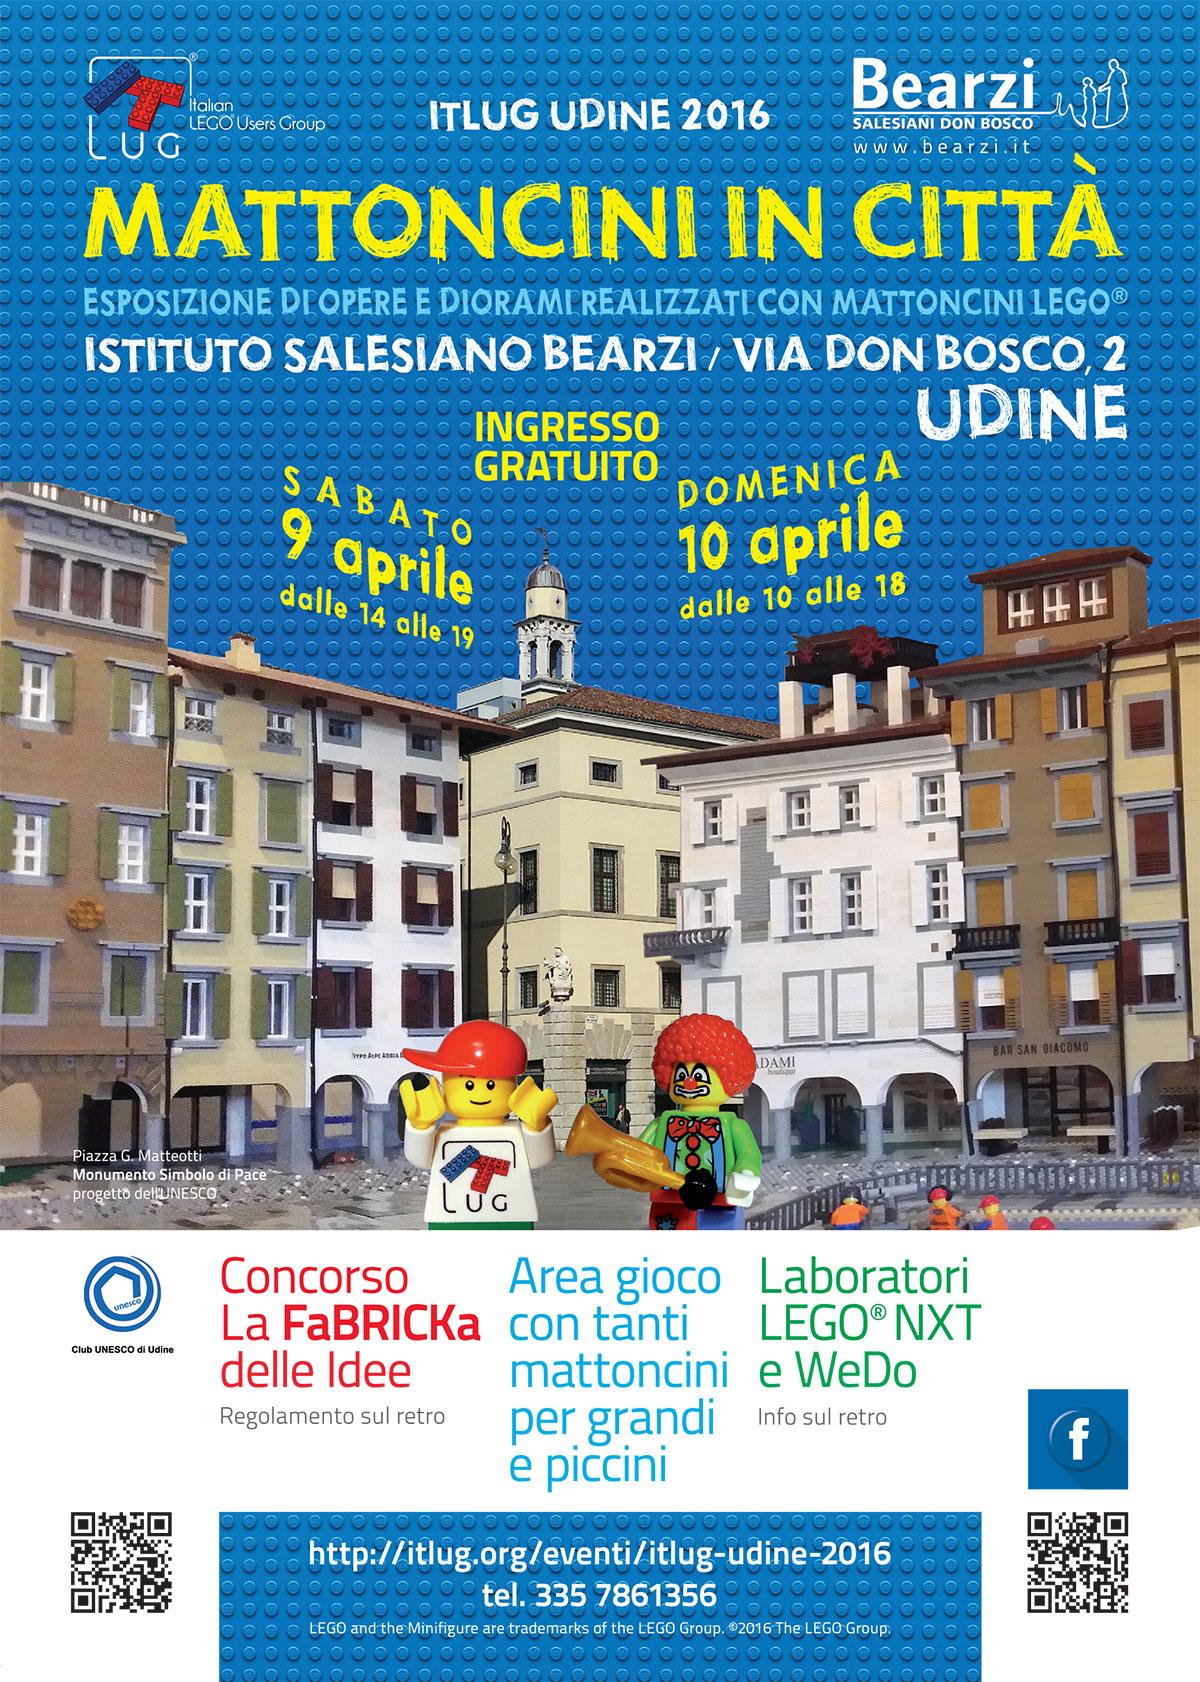 ItLUG Udine 2016 - Mattoncini in città